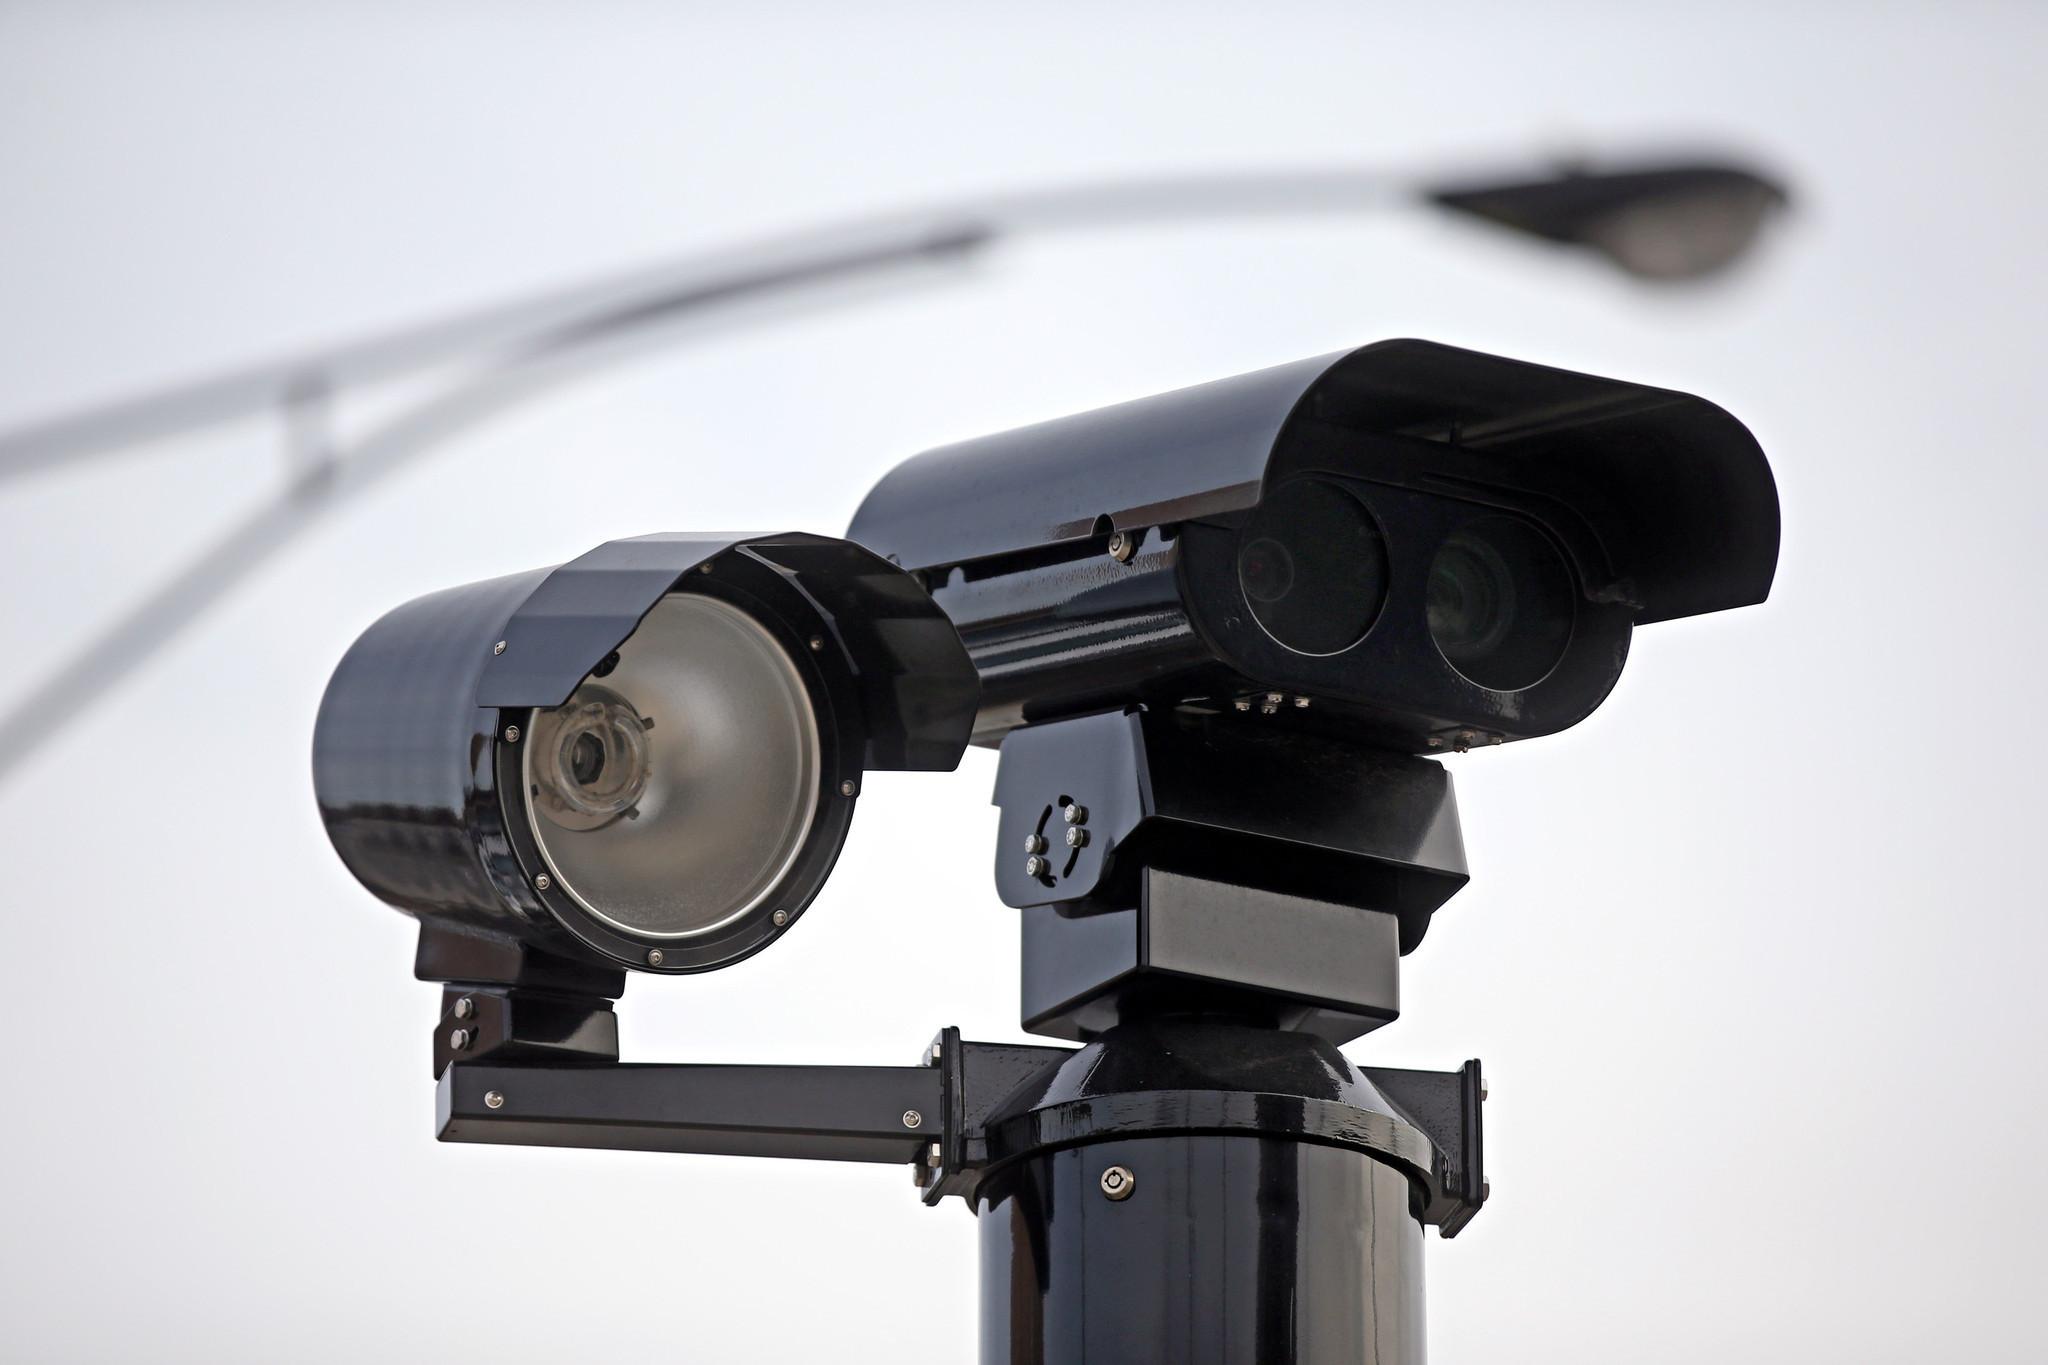 essay on red light cameras Argumentative essay on red light photo enforcement cameras custom essay [pewslideshow slidename=anim2.